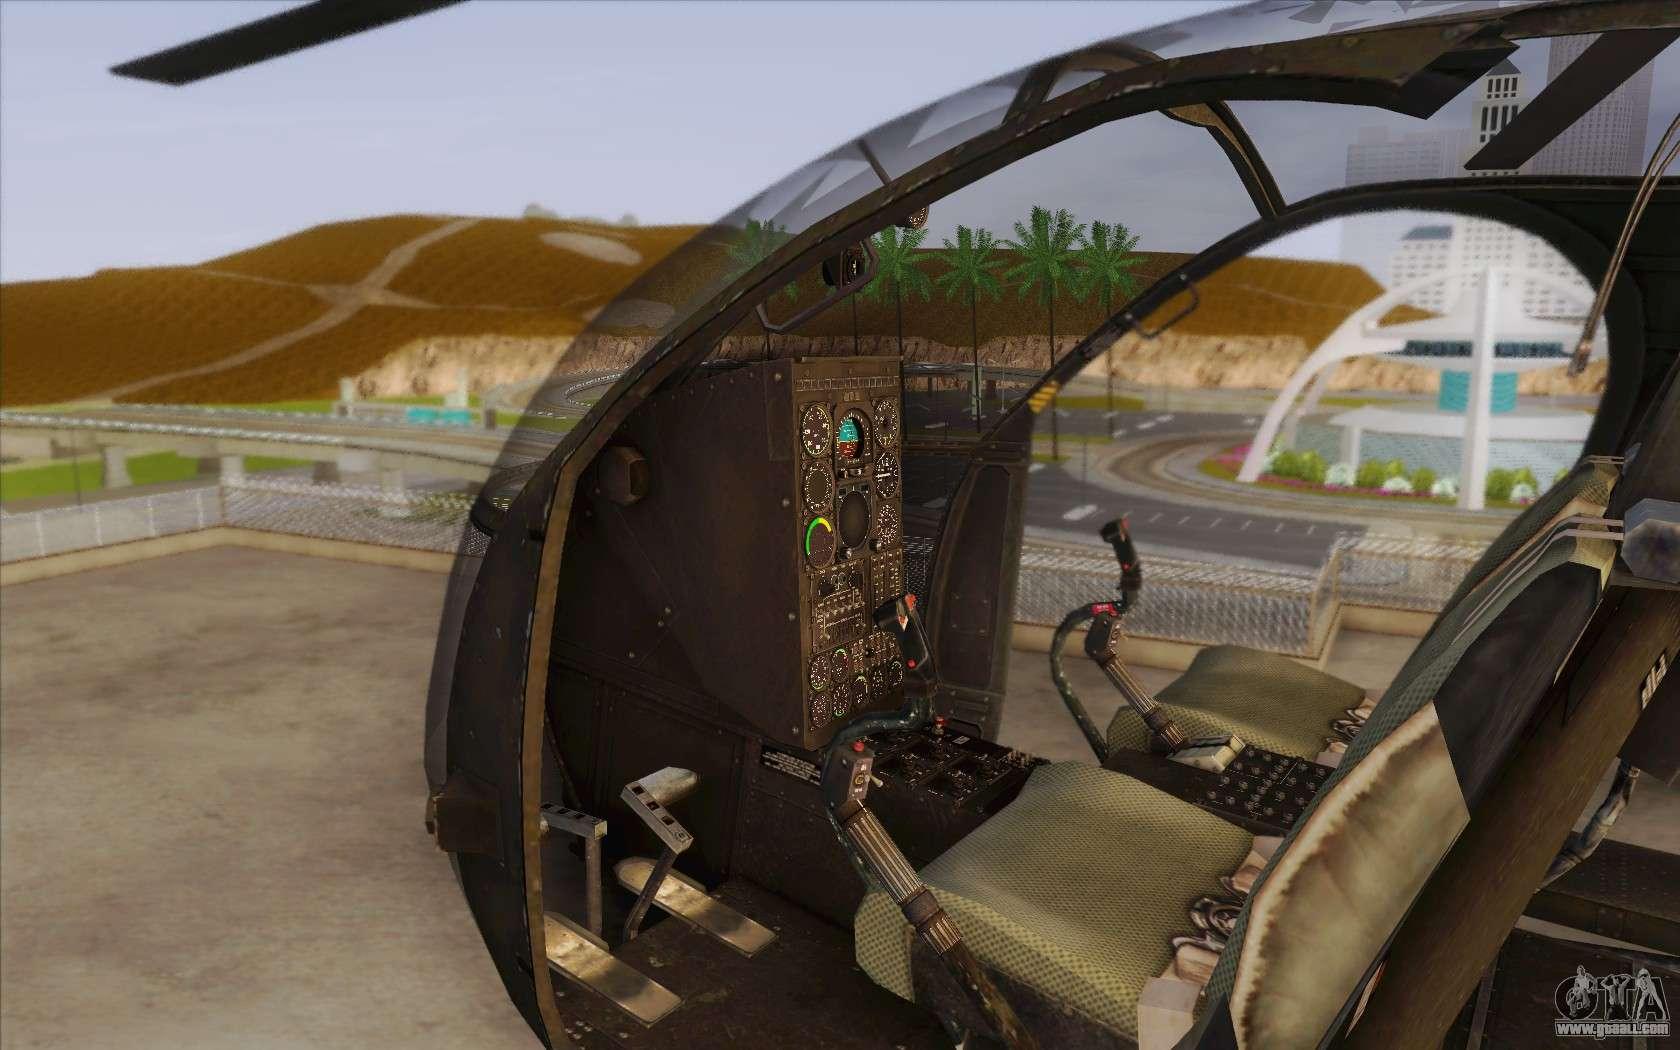 General Dynamics F16 Fighting Falcon  Wikipedia